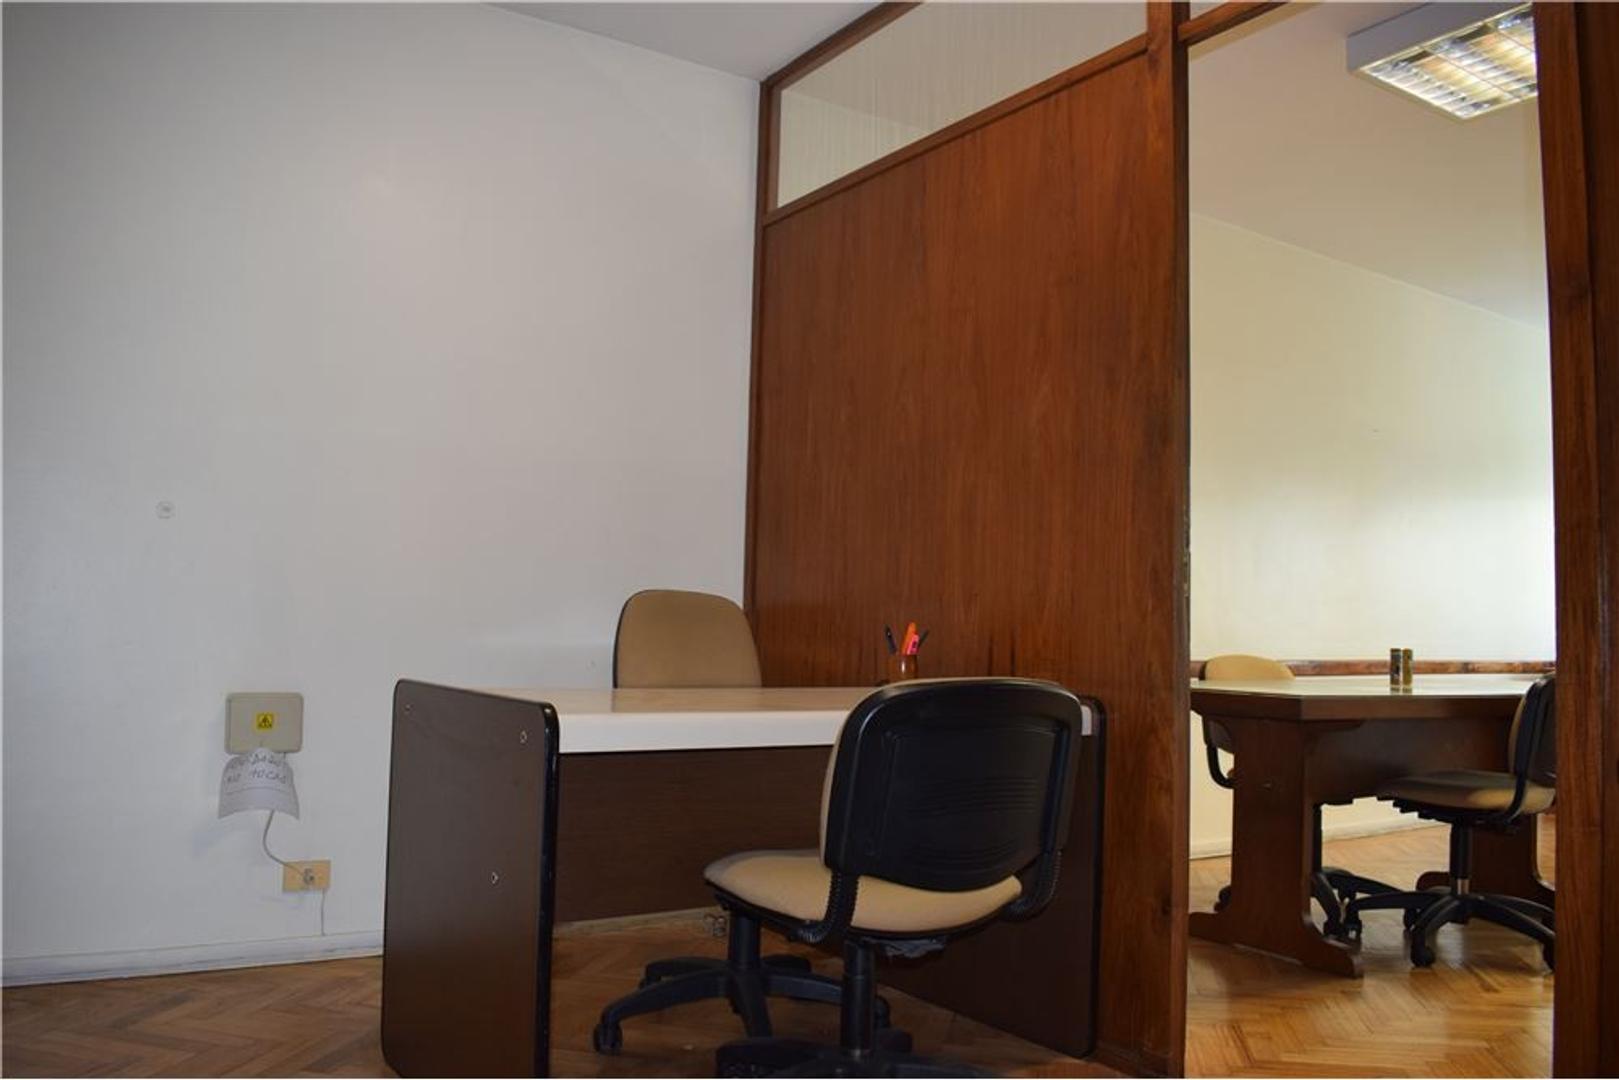 Oficina 60m2 - 2 baños - Maipu y Av. Córdoba